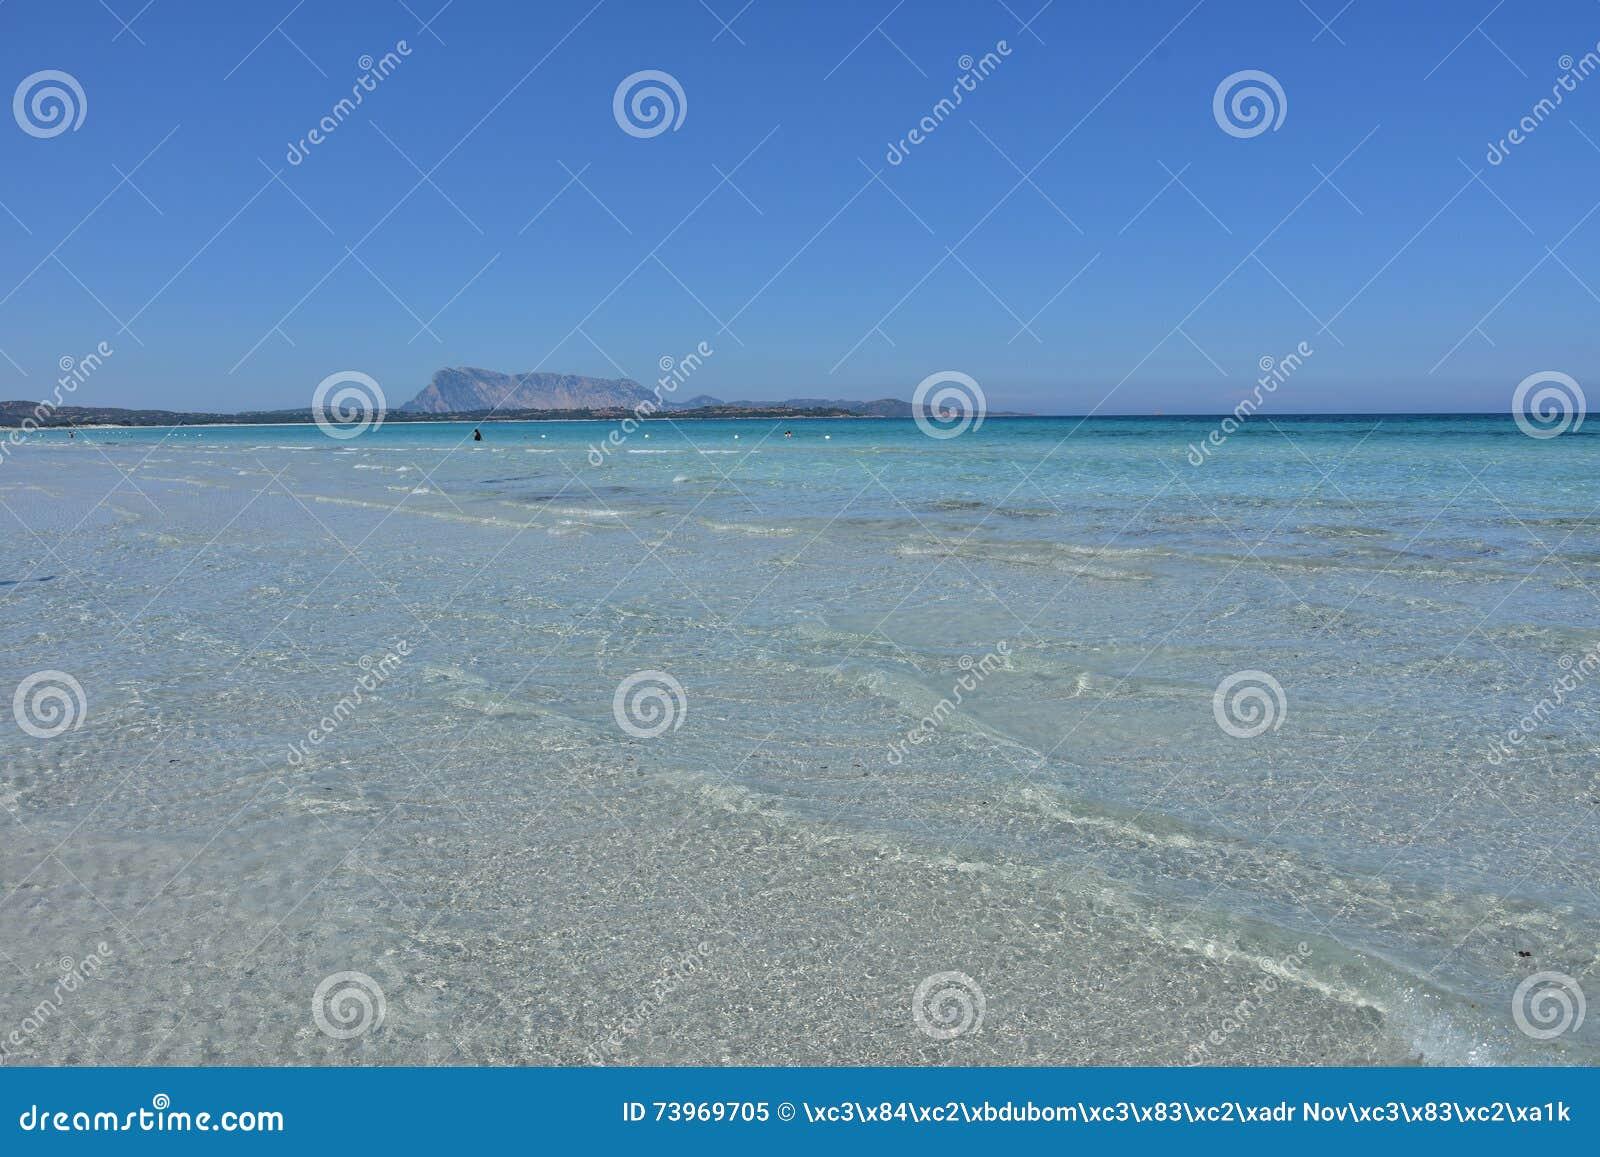 La Cinta beach in San Teodoro, Sardinia